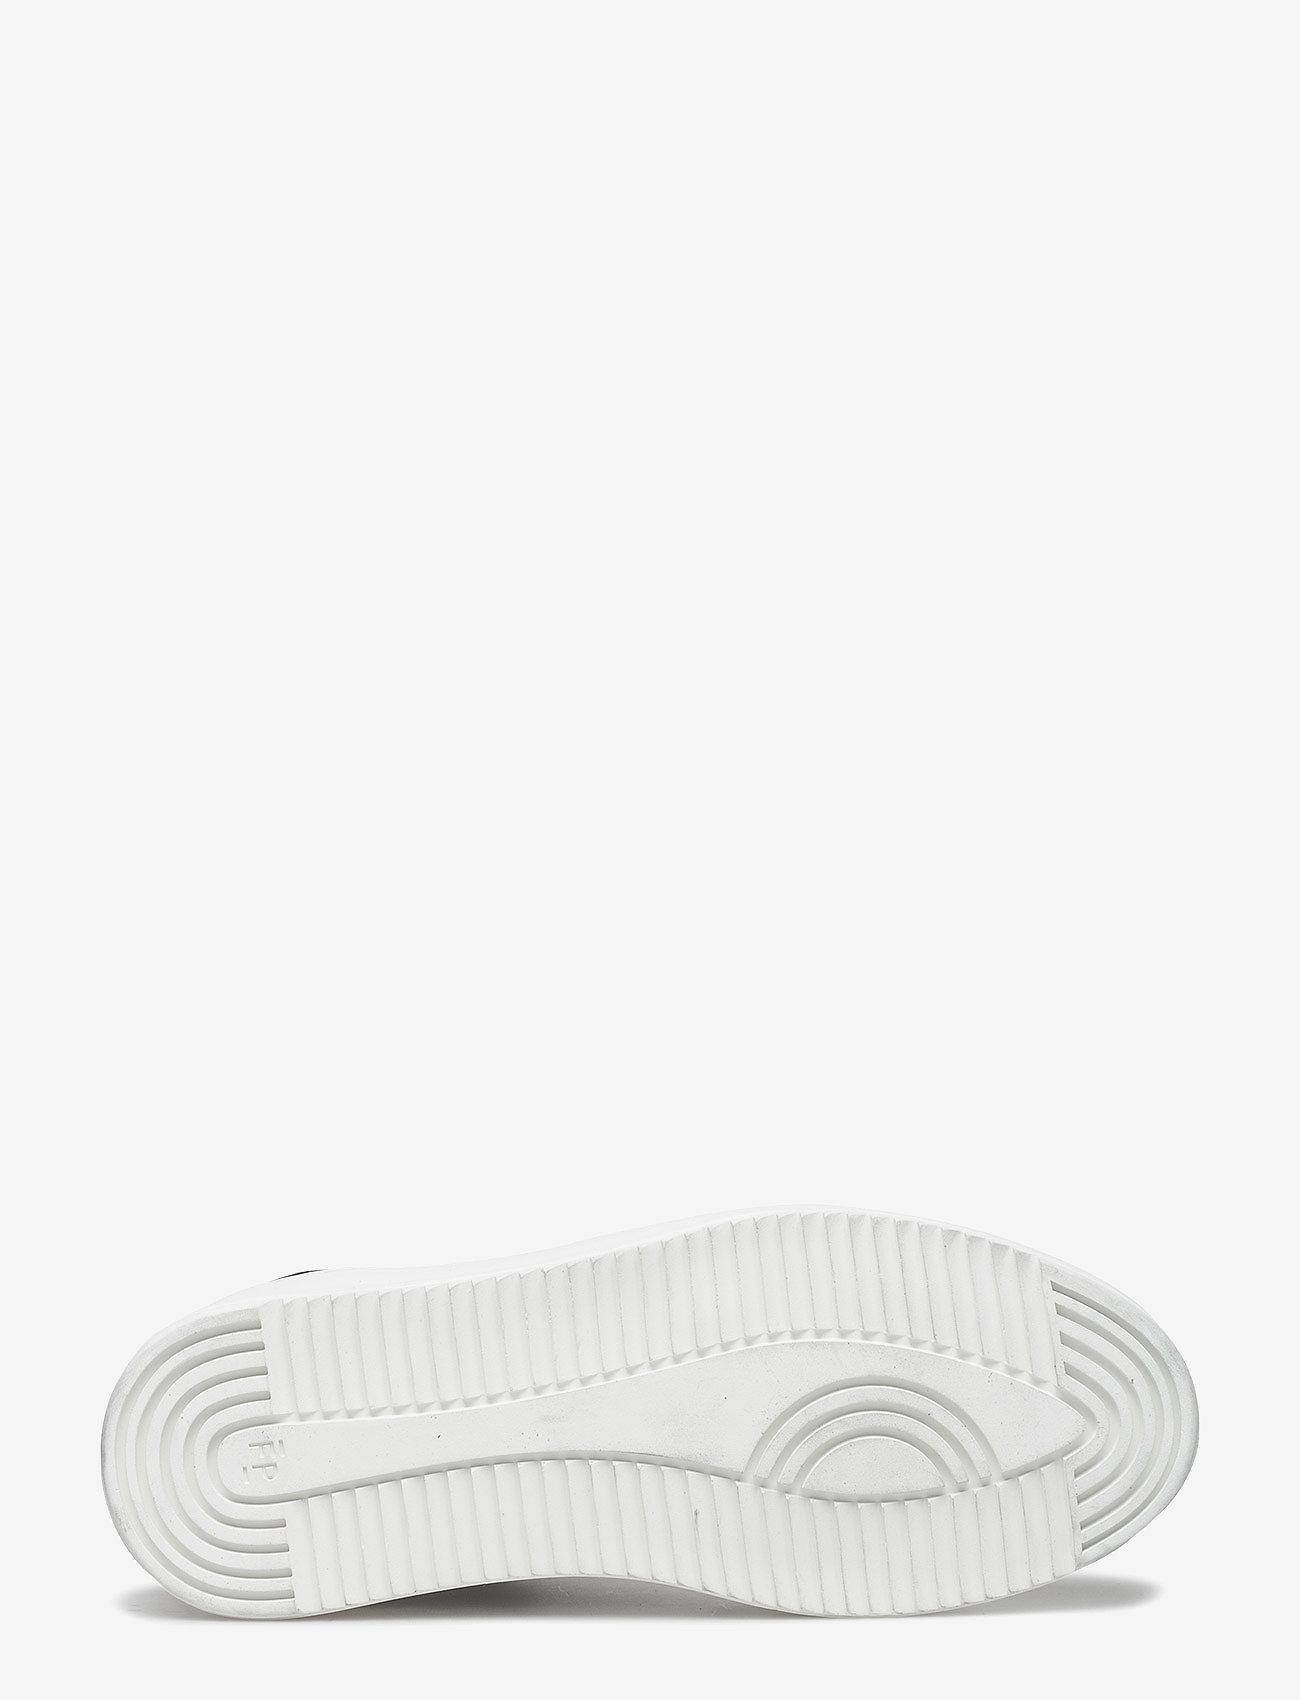 Filling Pieces - Low Top Ripple Basic Black / White - låga sneakers - black/white - 4